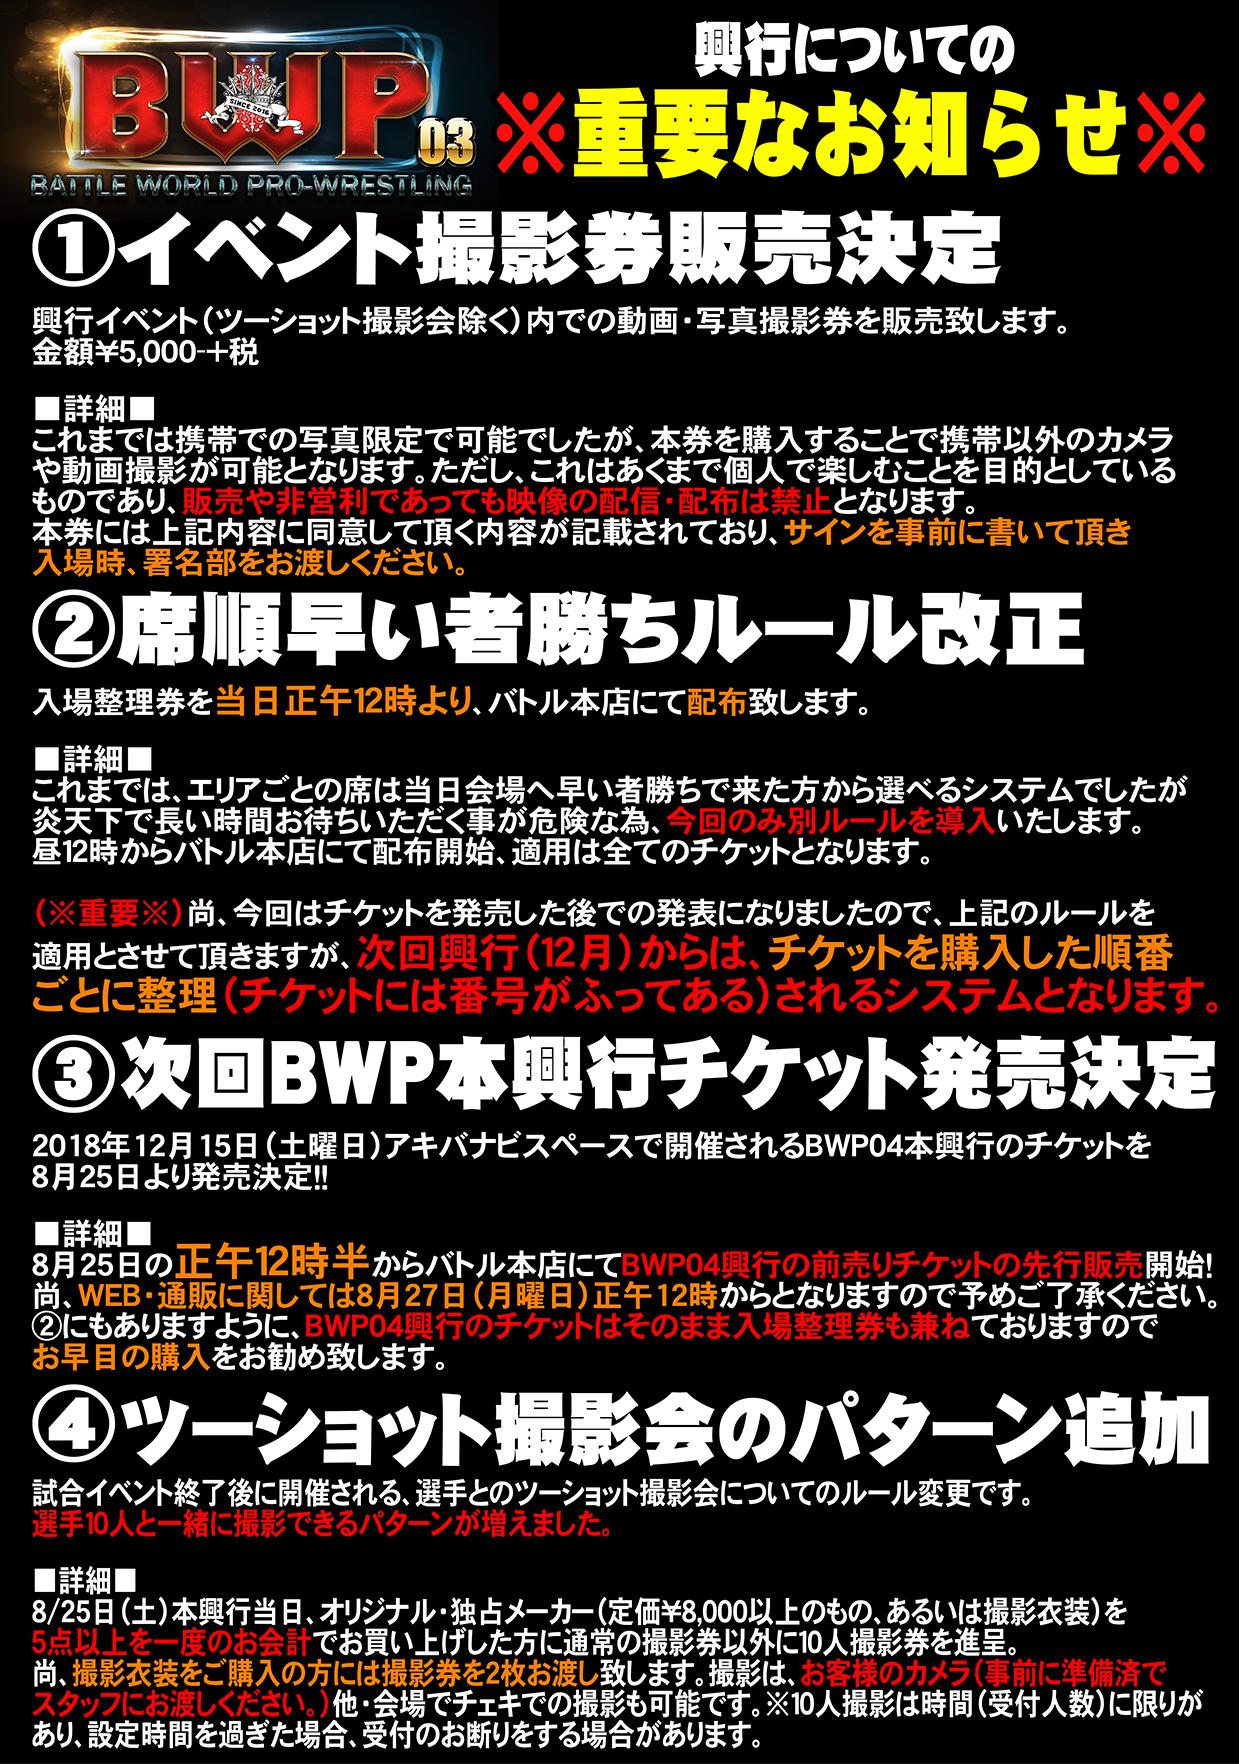 BWP03_注意告知ポスター_web